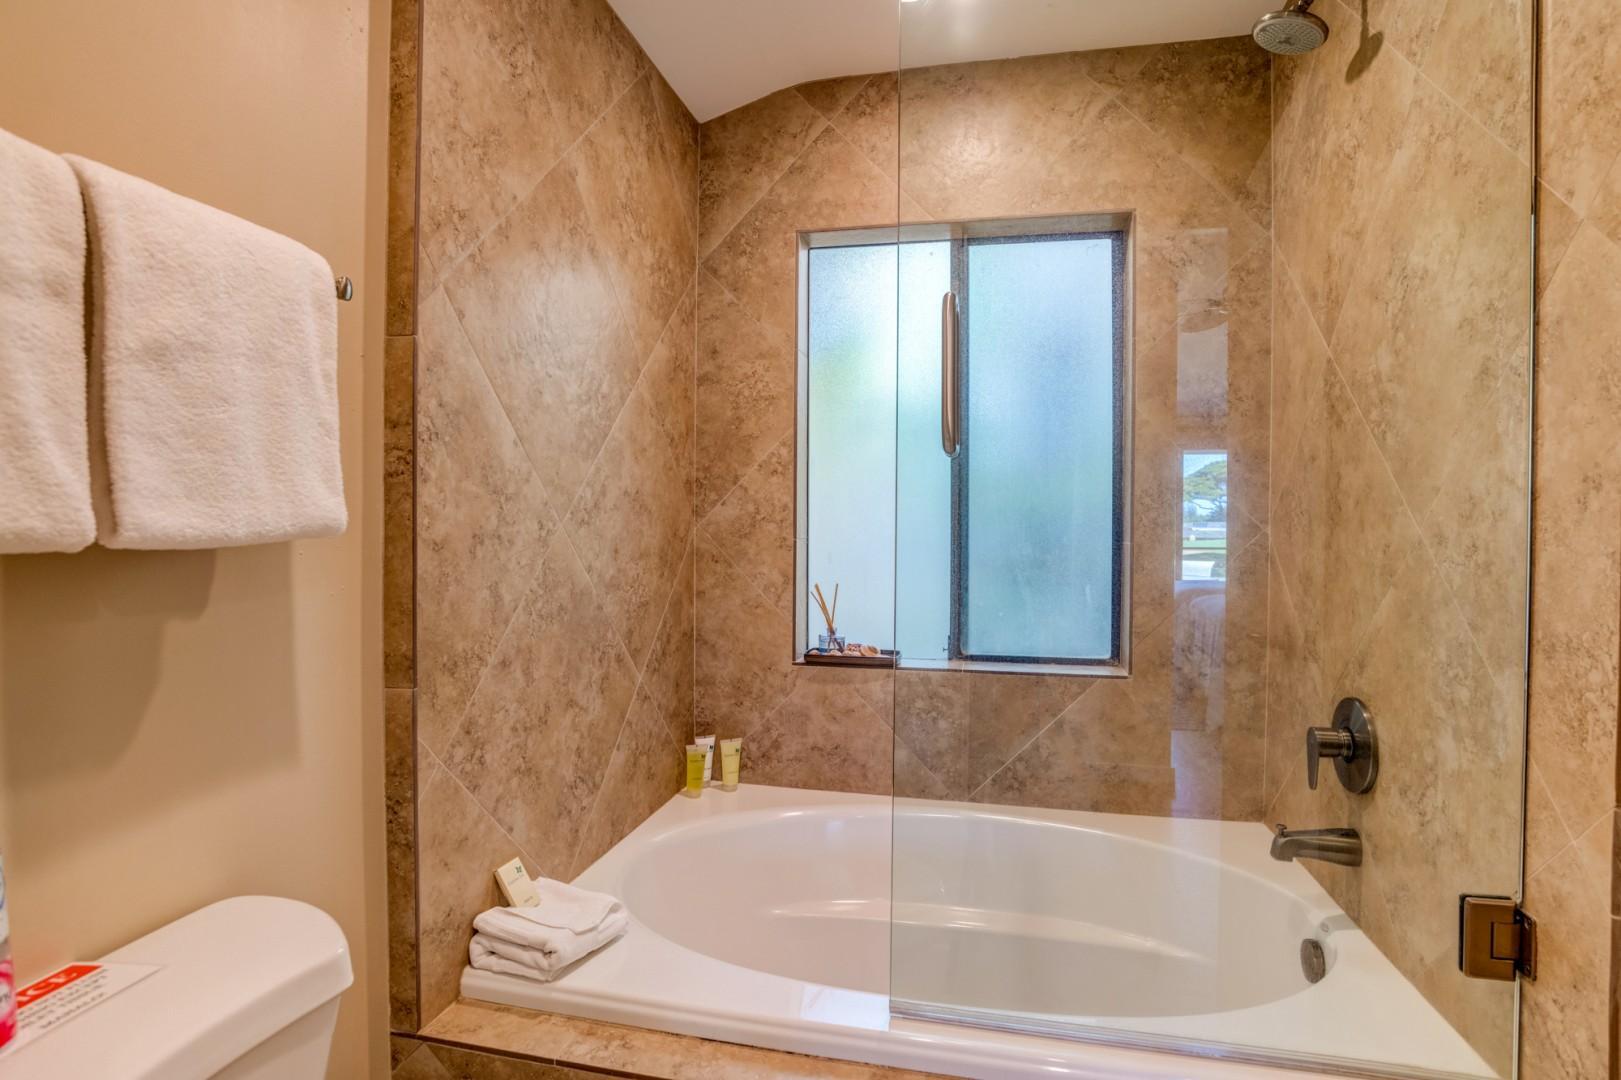 Enjoy a large soaking tub